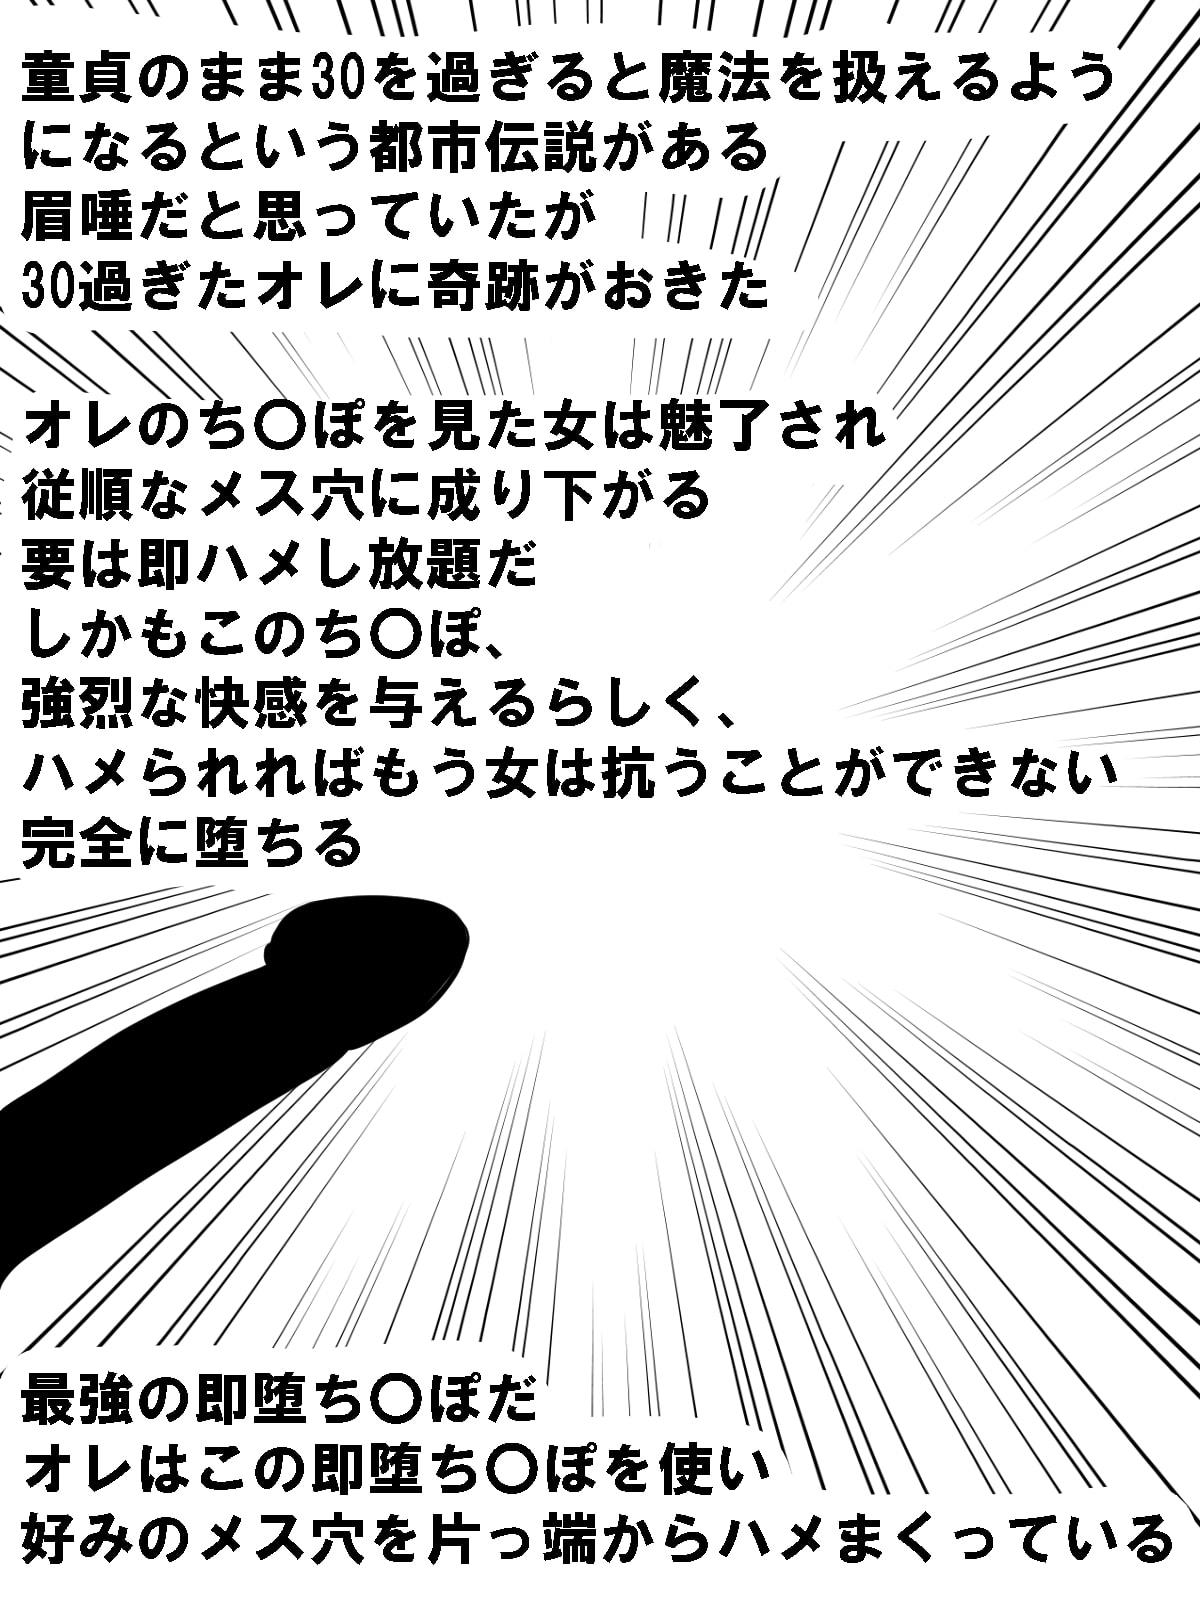 RJ343077 即堕ち〇ぽ  7 ~ヒーロー堕ち2~ [20210925]